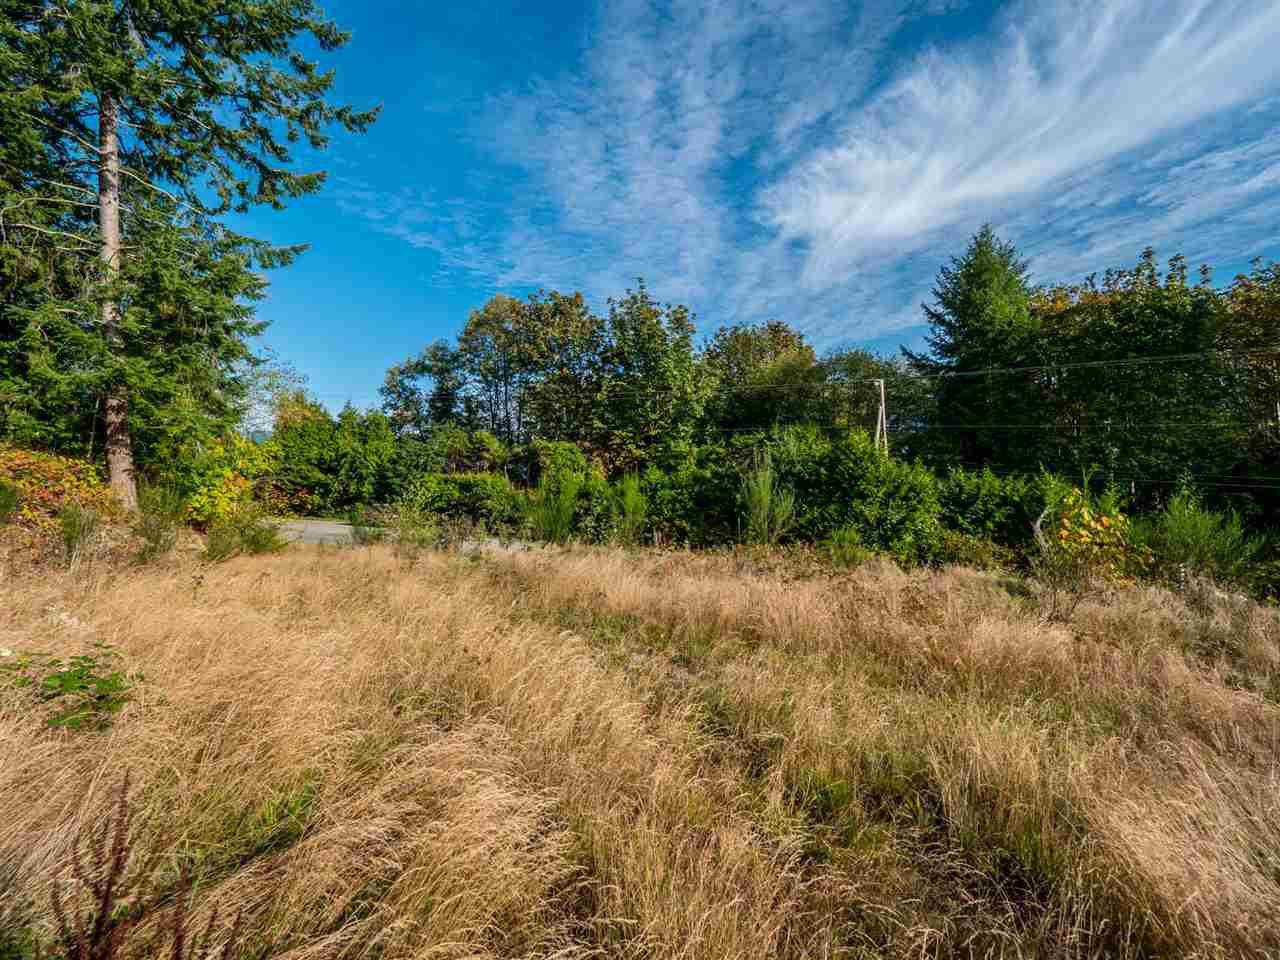 Main Photo: LOT Z 6333 N GALE AVENUE in Sechelt: Sechelt District Land for sale (Sunshine Coast)  : MLS®# R2409681